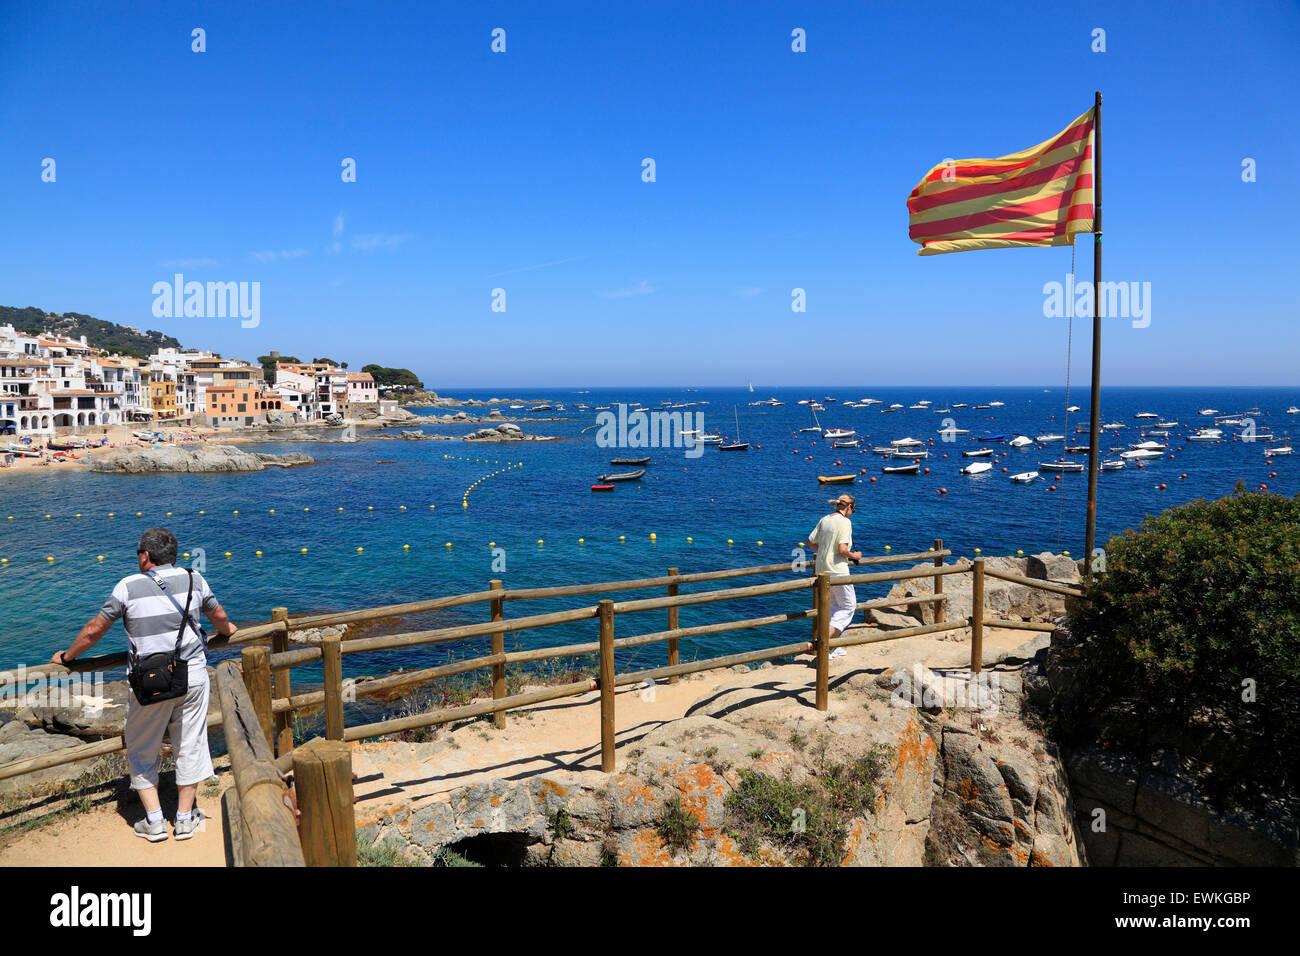 outlook at Calella de Palafrugell beach, Costa Brava, Catalonia, Spain, Europe - Stock Image